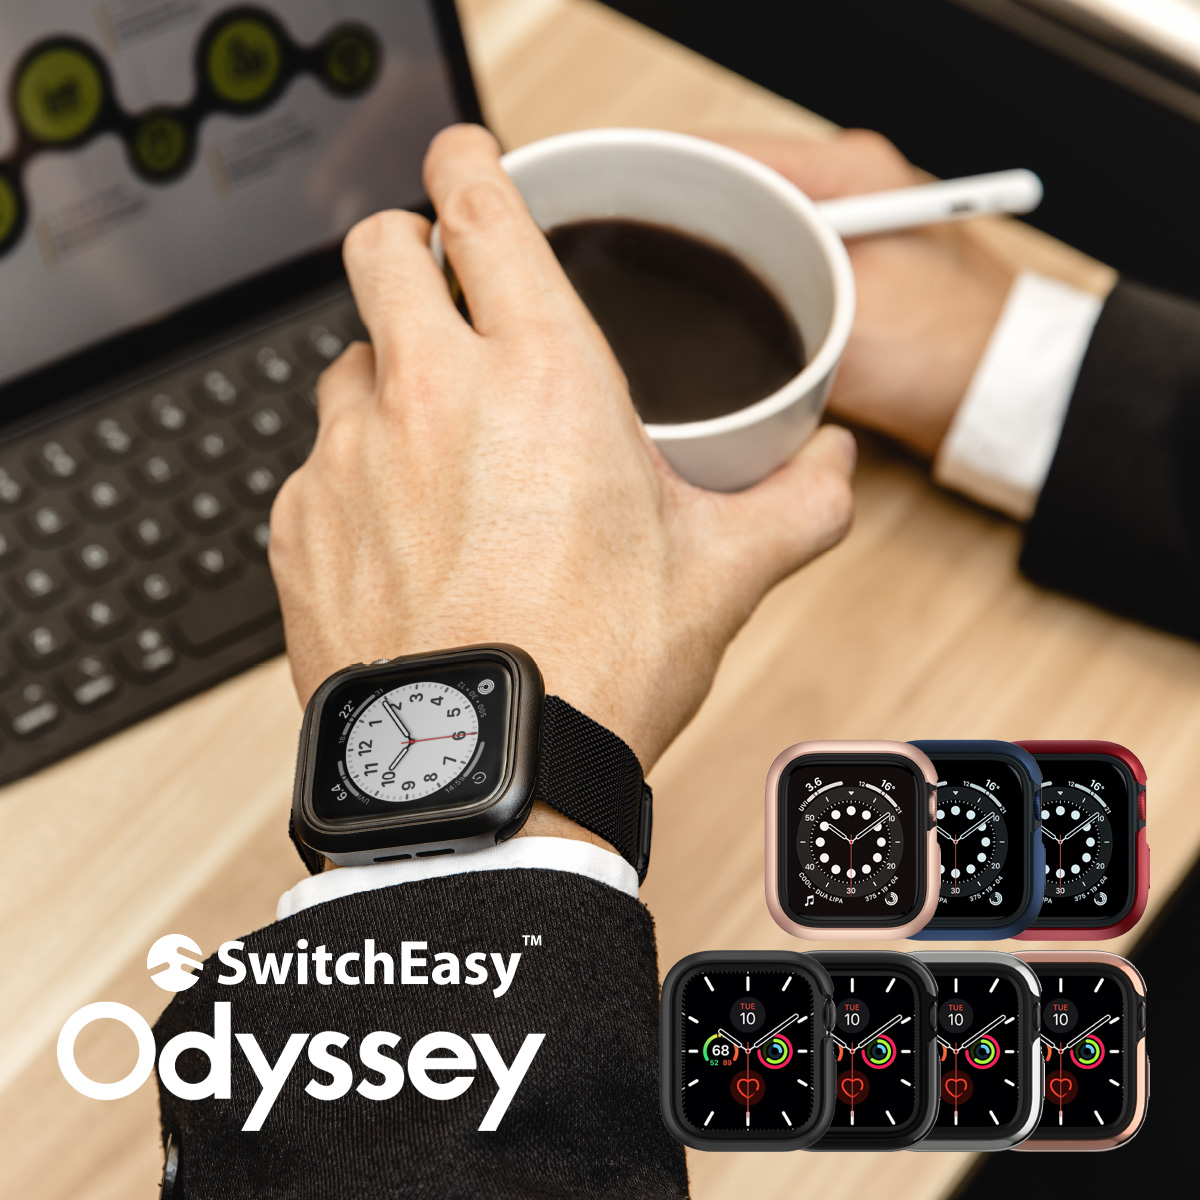 Apple Watch Series 5 / Series 4 44mm カバー アルミ × TPU 耐衝撃 ケース 2重構造 デザイン 衝撃 吸収 ハイブリッド カバー 衝撃に強い 落下に強い 対衝撃 保護 ケース [ AppleWatch アップルウォッチ シリーズ5 シリーズ4 44mm 対応 ] SwitchEasy Odyssey